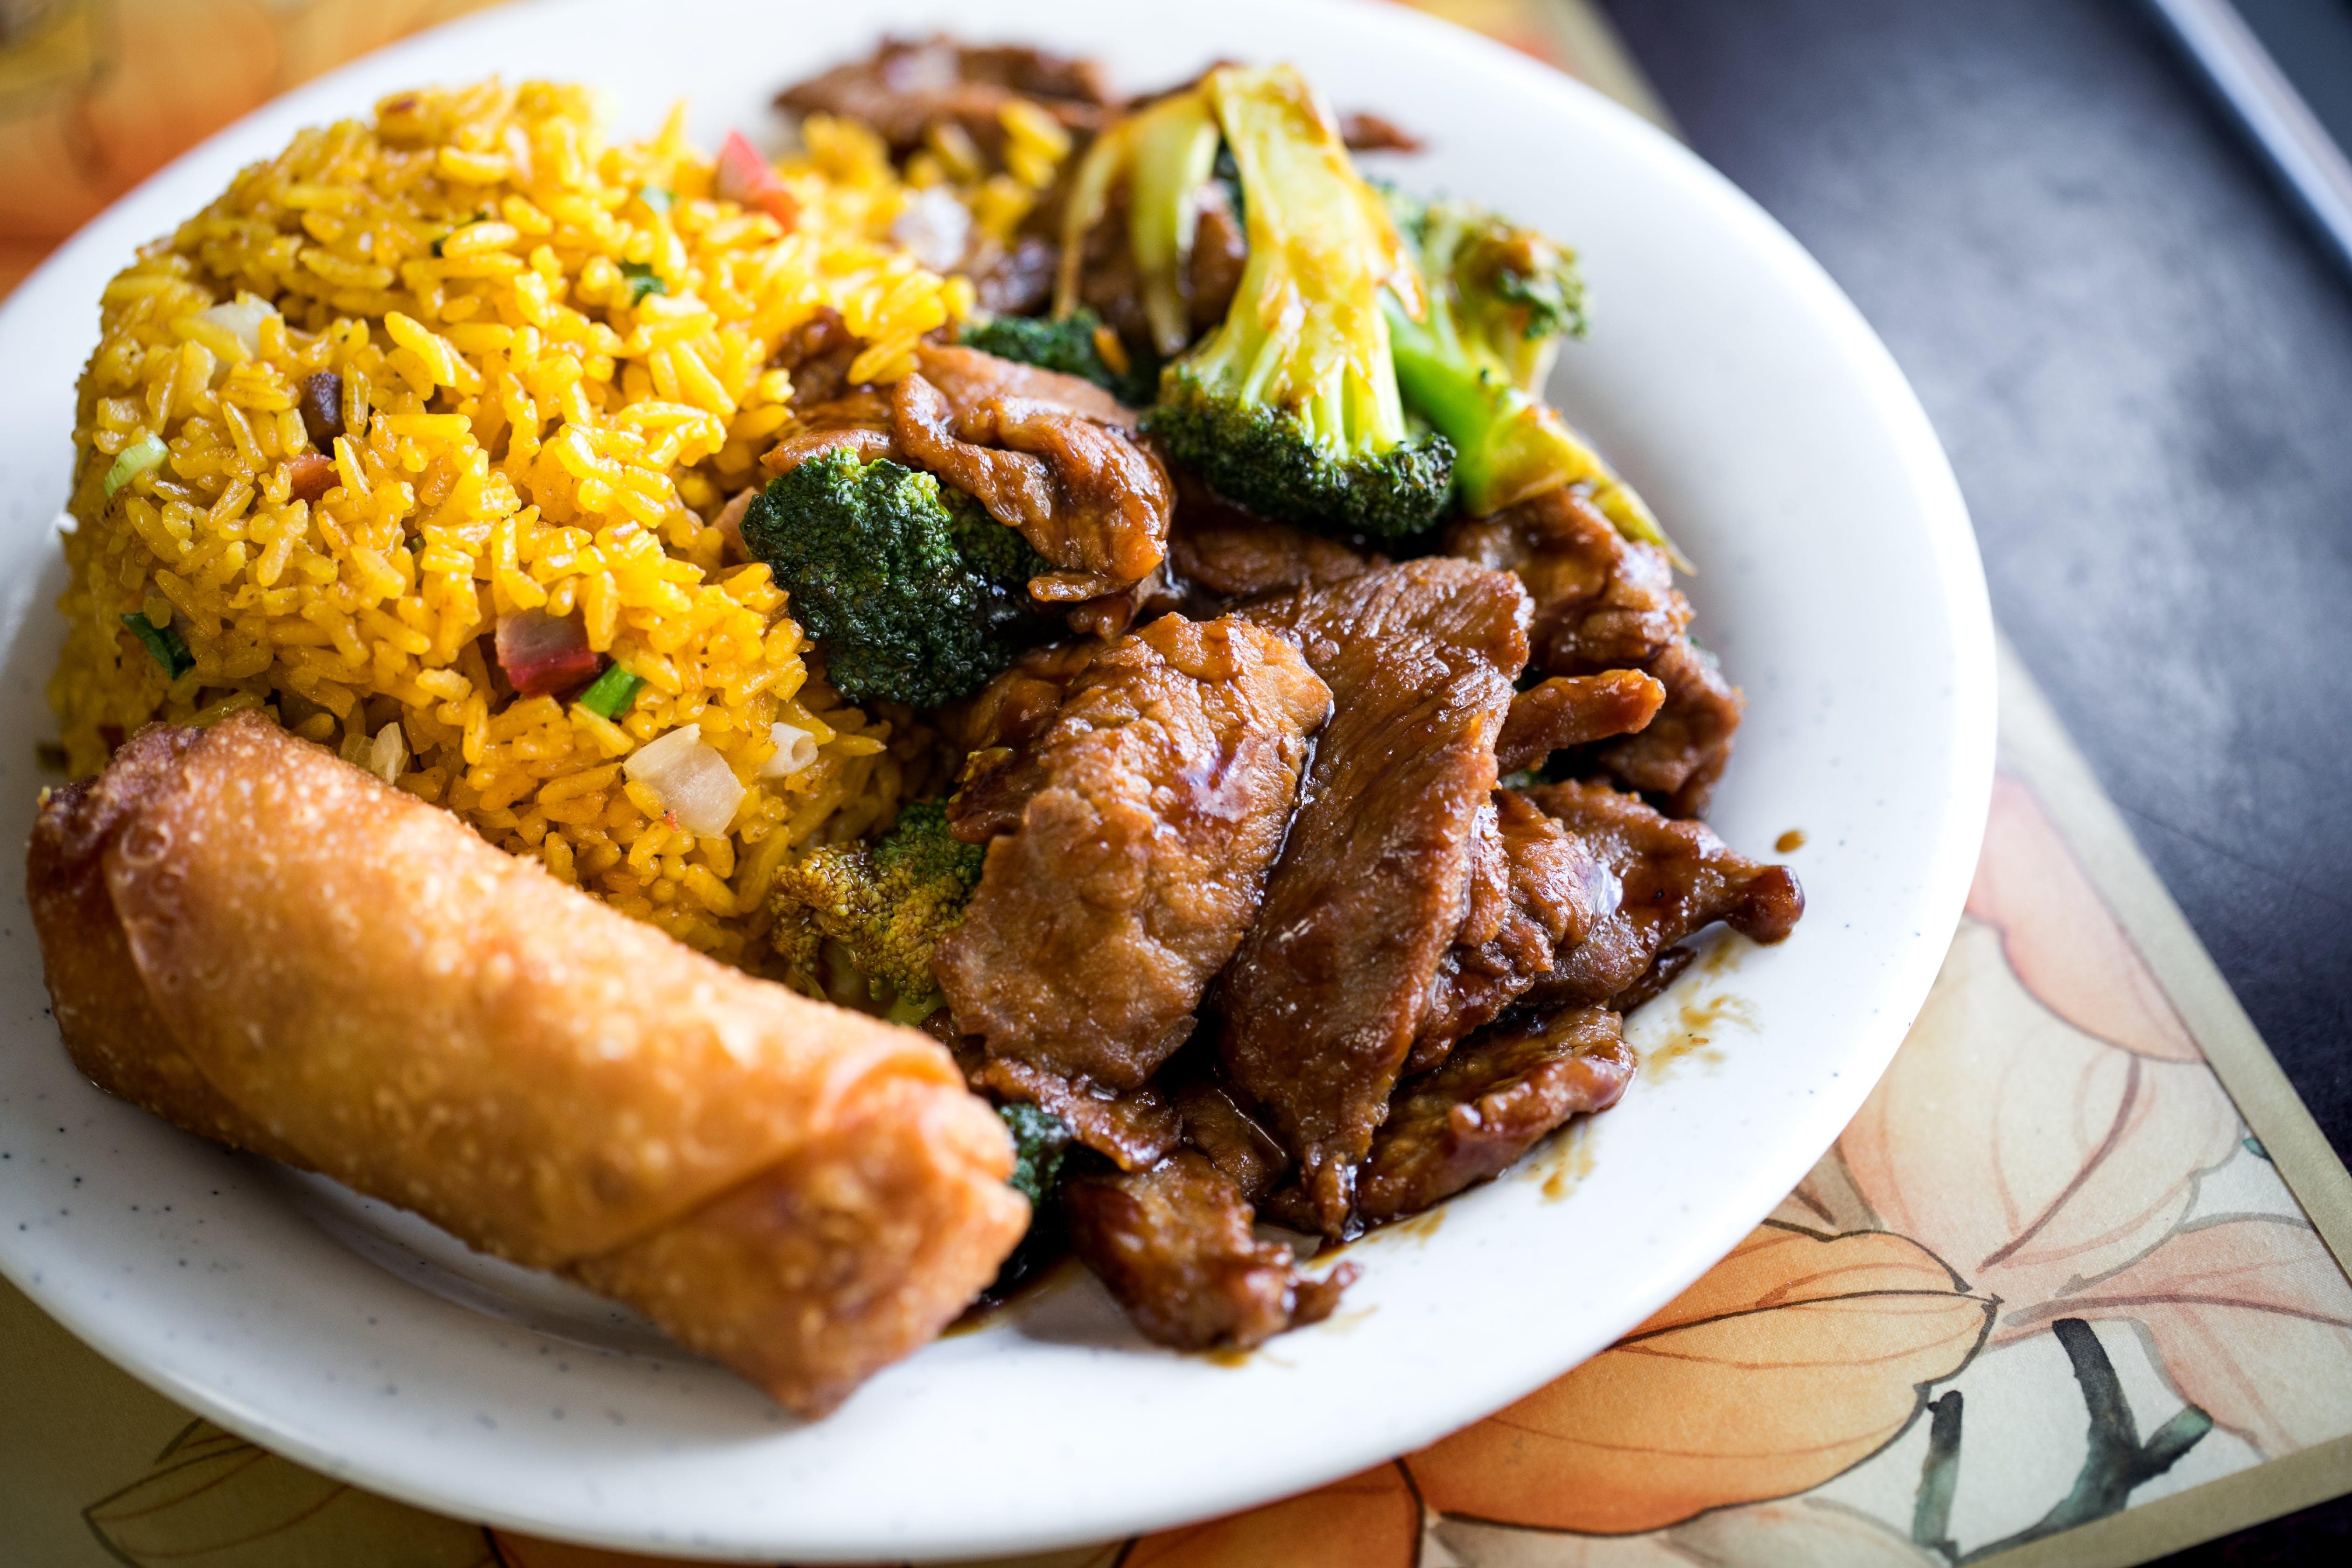 72. Beef w. Broccoli from Good Taste Chinese Restaurant in Richmond, VA